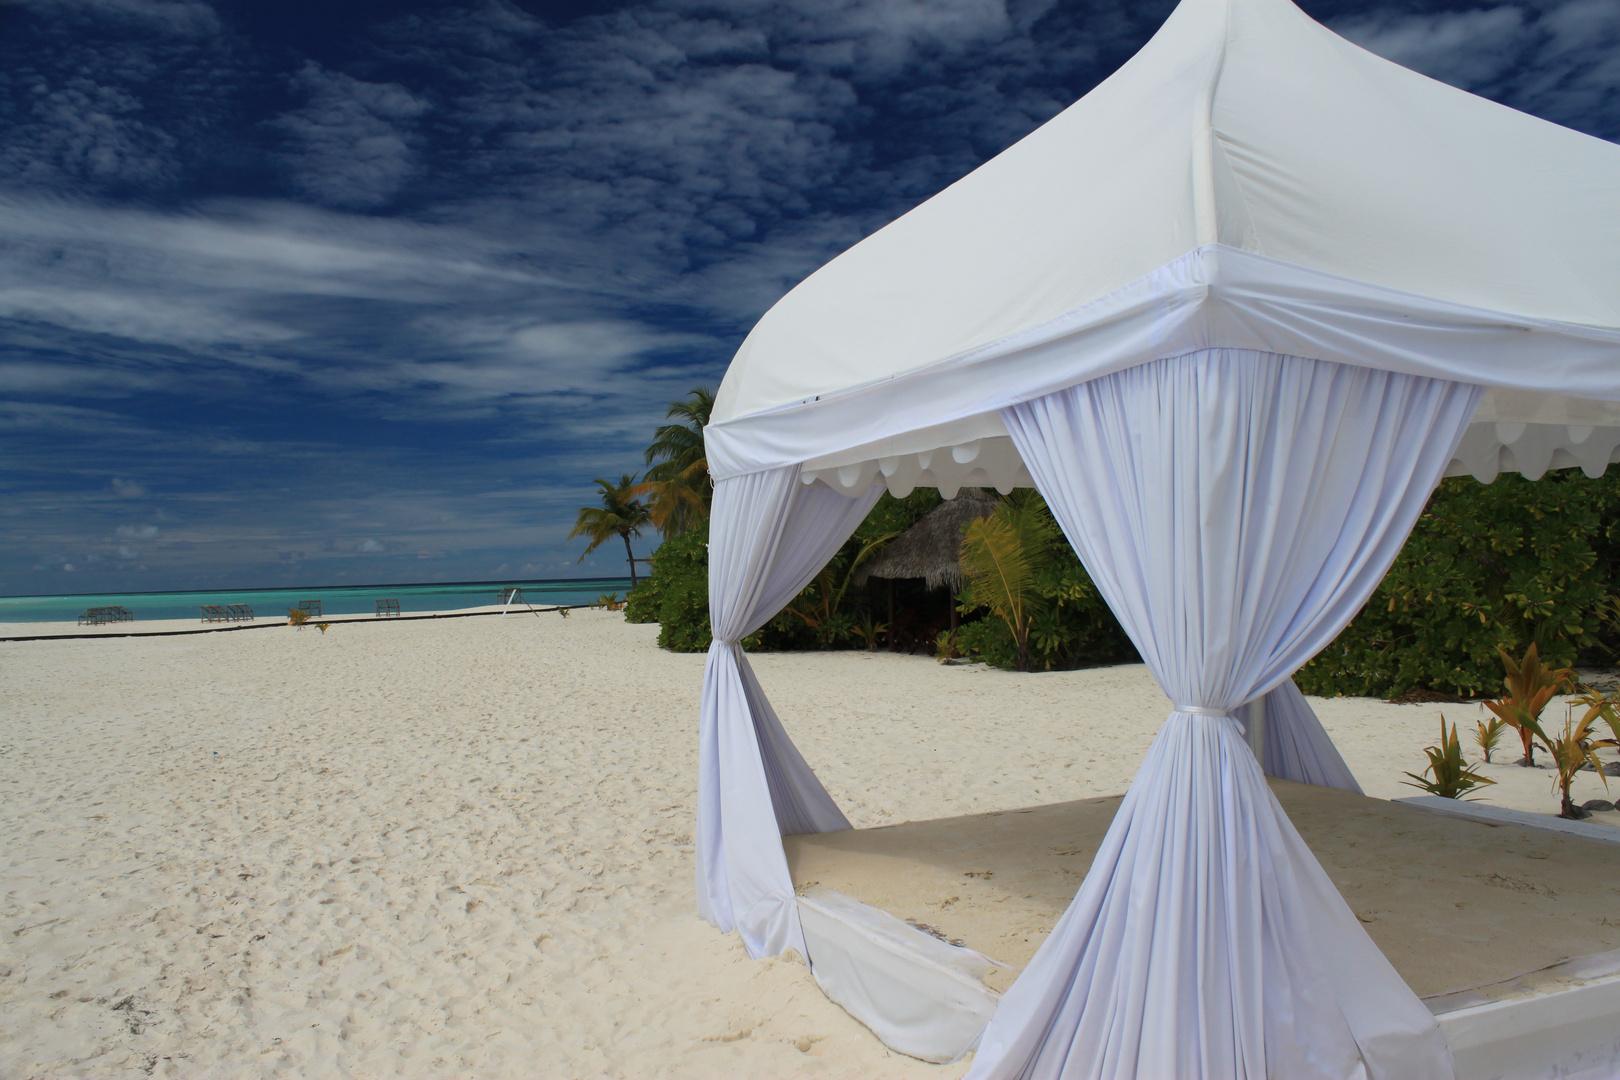 Hochzeit Auf Den Malediven Foto Bild Asia Indian Ocean